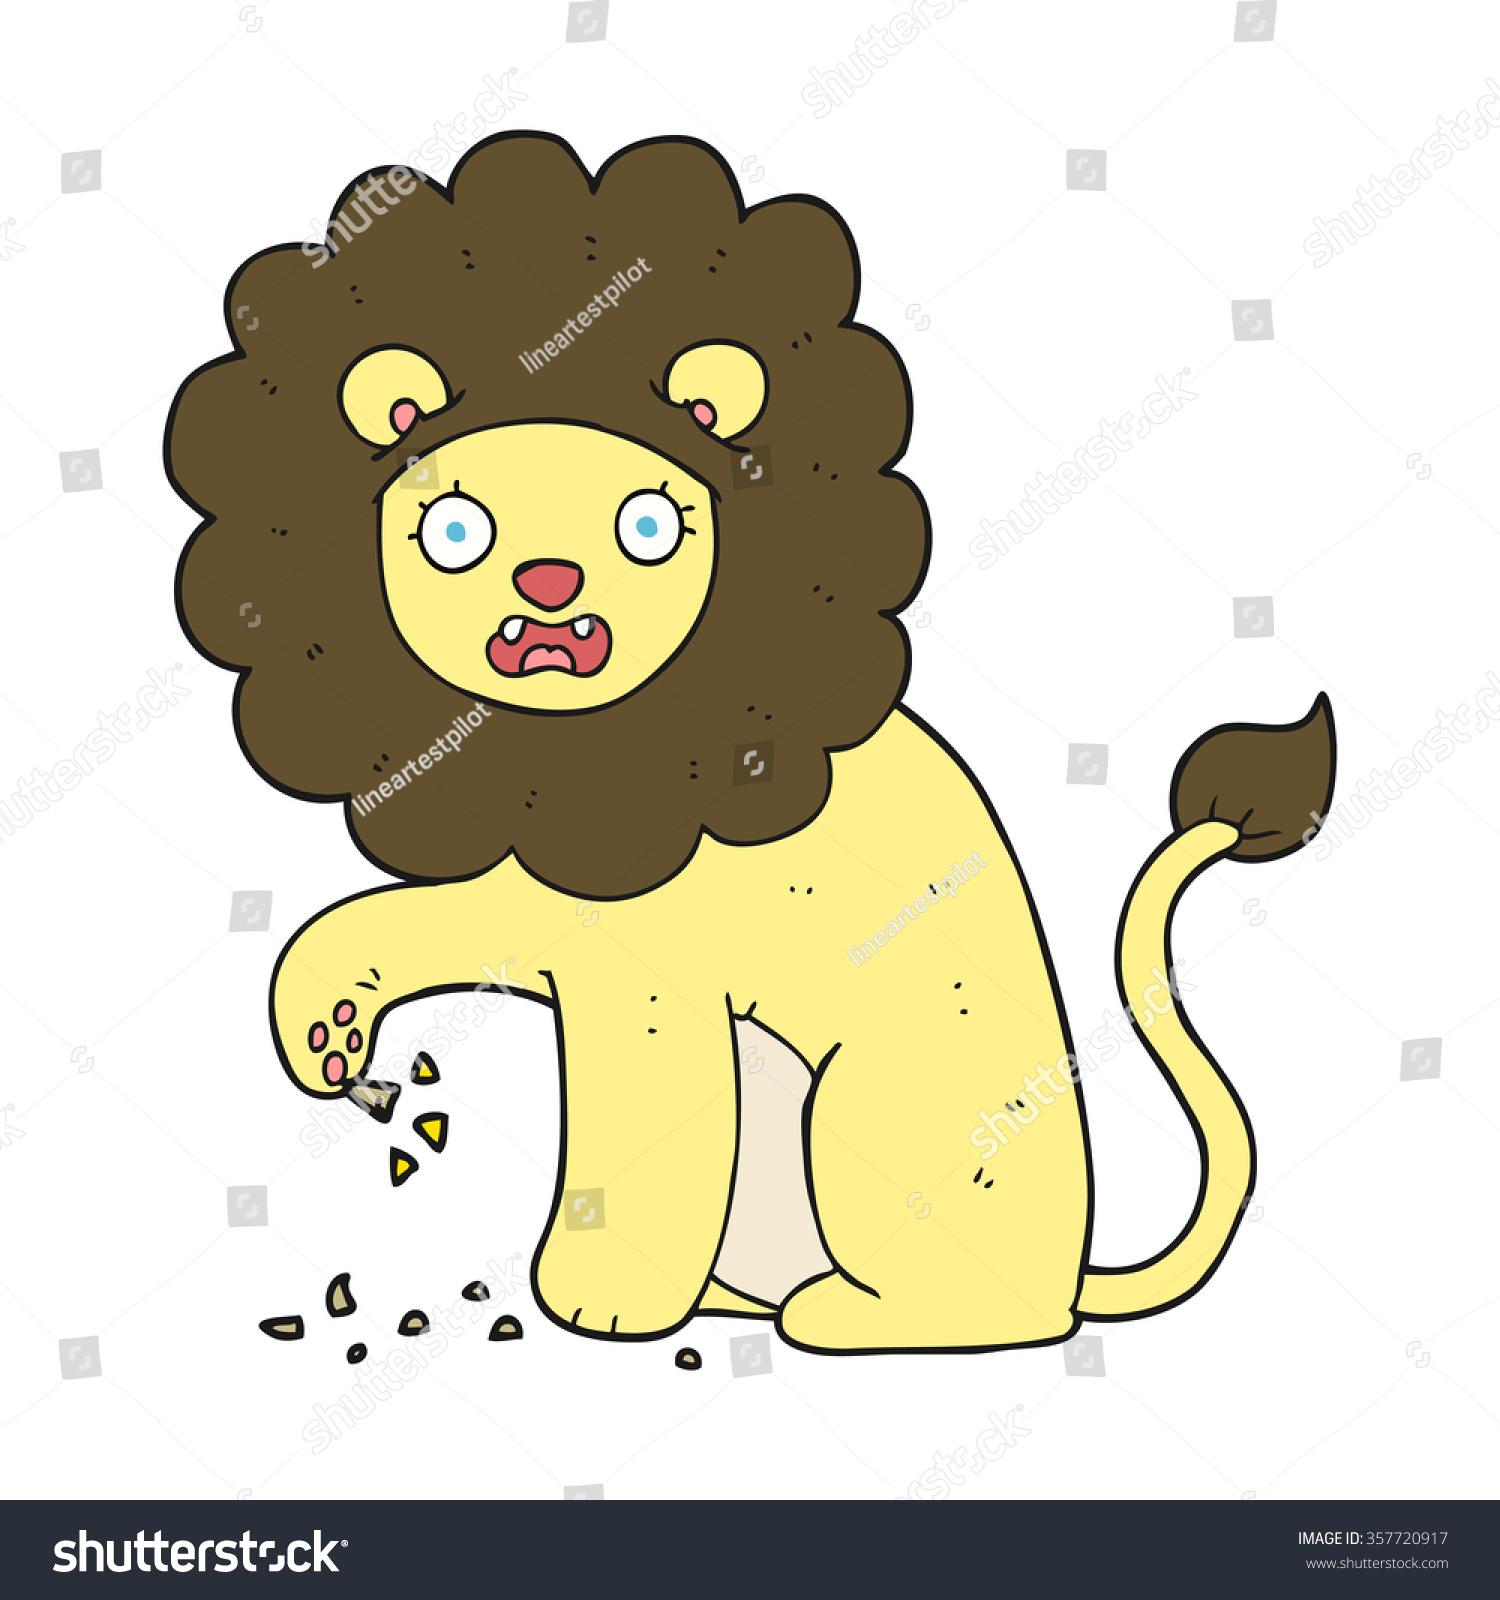 Freehand Drawn Cartoon Lion Thorn Foot Stock Illustration ...